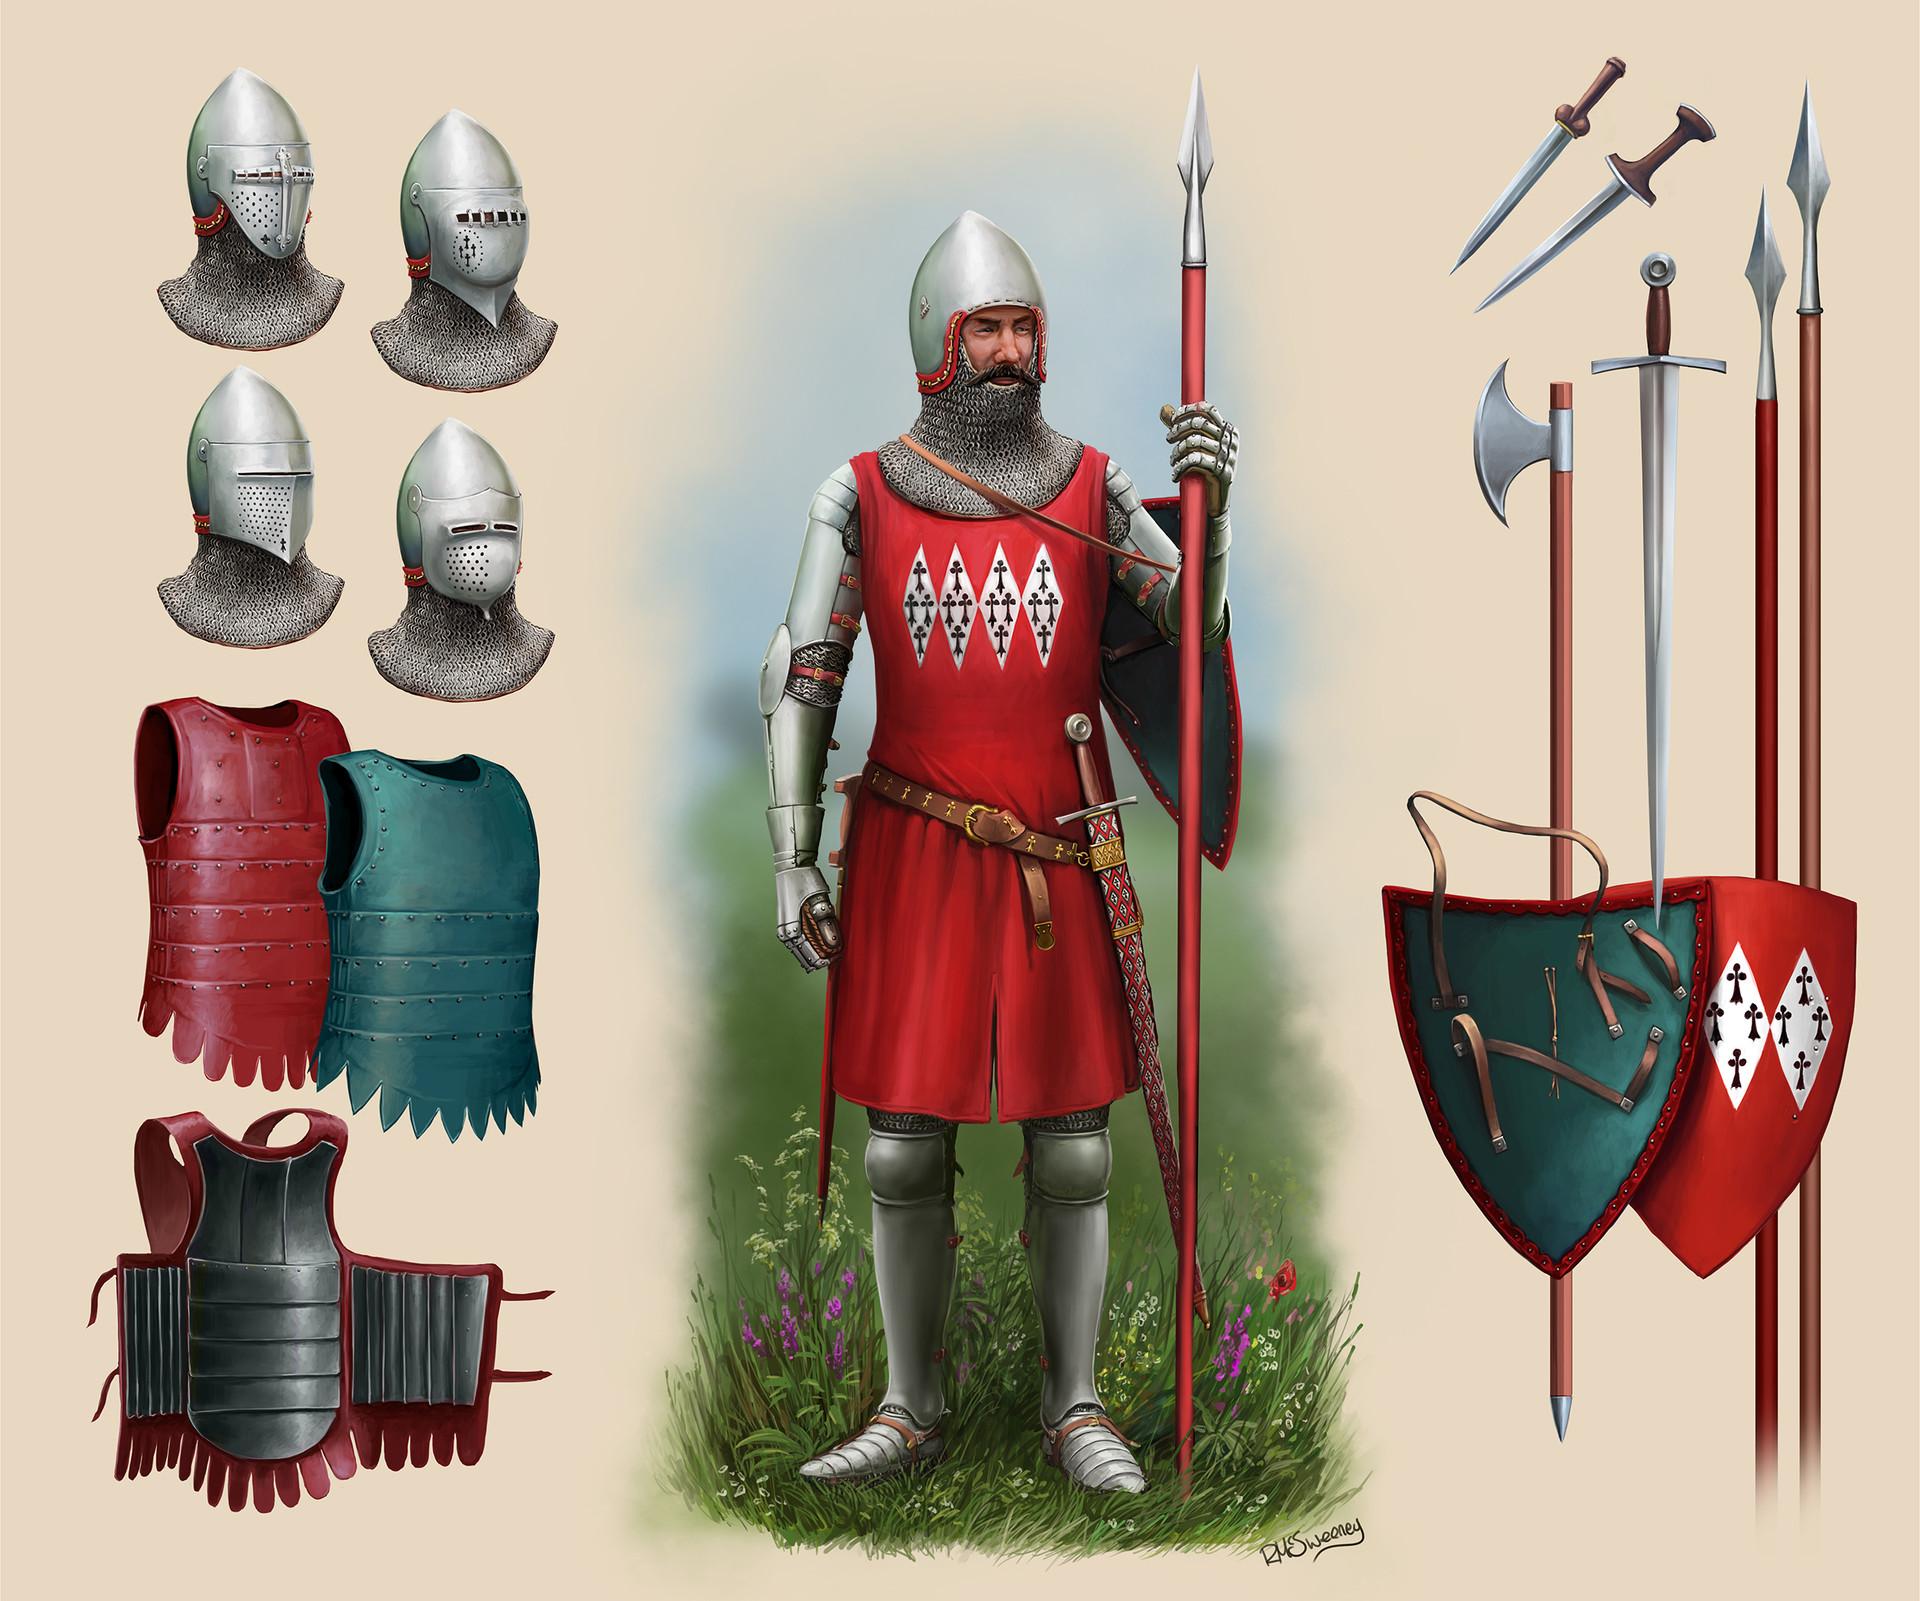 robbie-mcsweeney-waddesdon-knight-10-10-